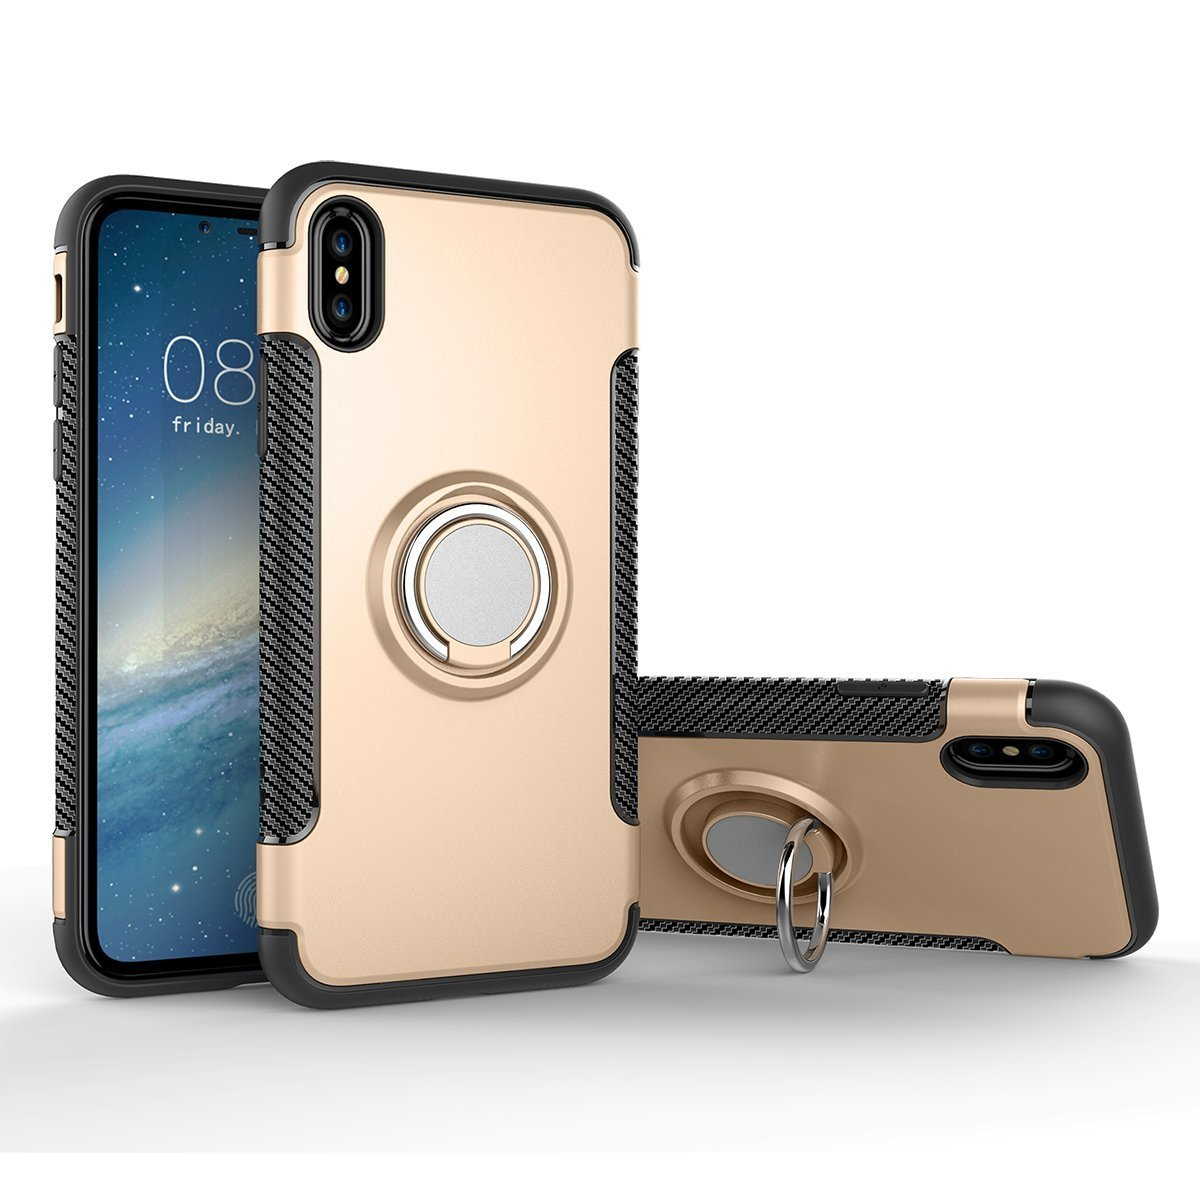 iPhone x磁気車電話スタンドケース、Inspirationc 2 in 1耐衝撃360度回転リングスタンドwith Air Vent磁気車ベントマウントゴムケースiPhone X iPhone X ゴールド B075LP1Q7R  ゴールド iPhone X